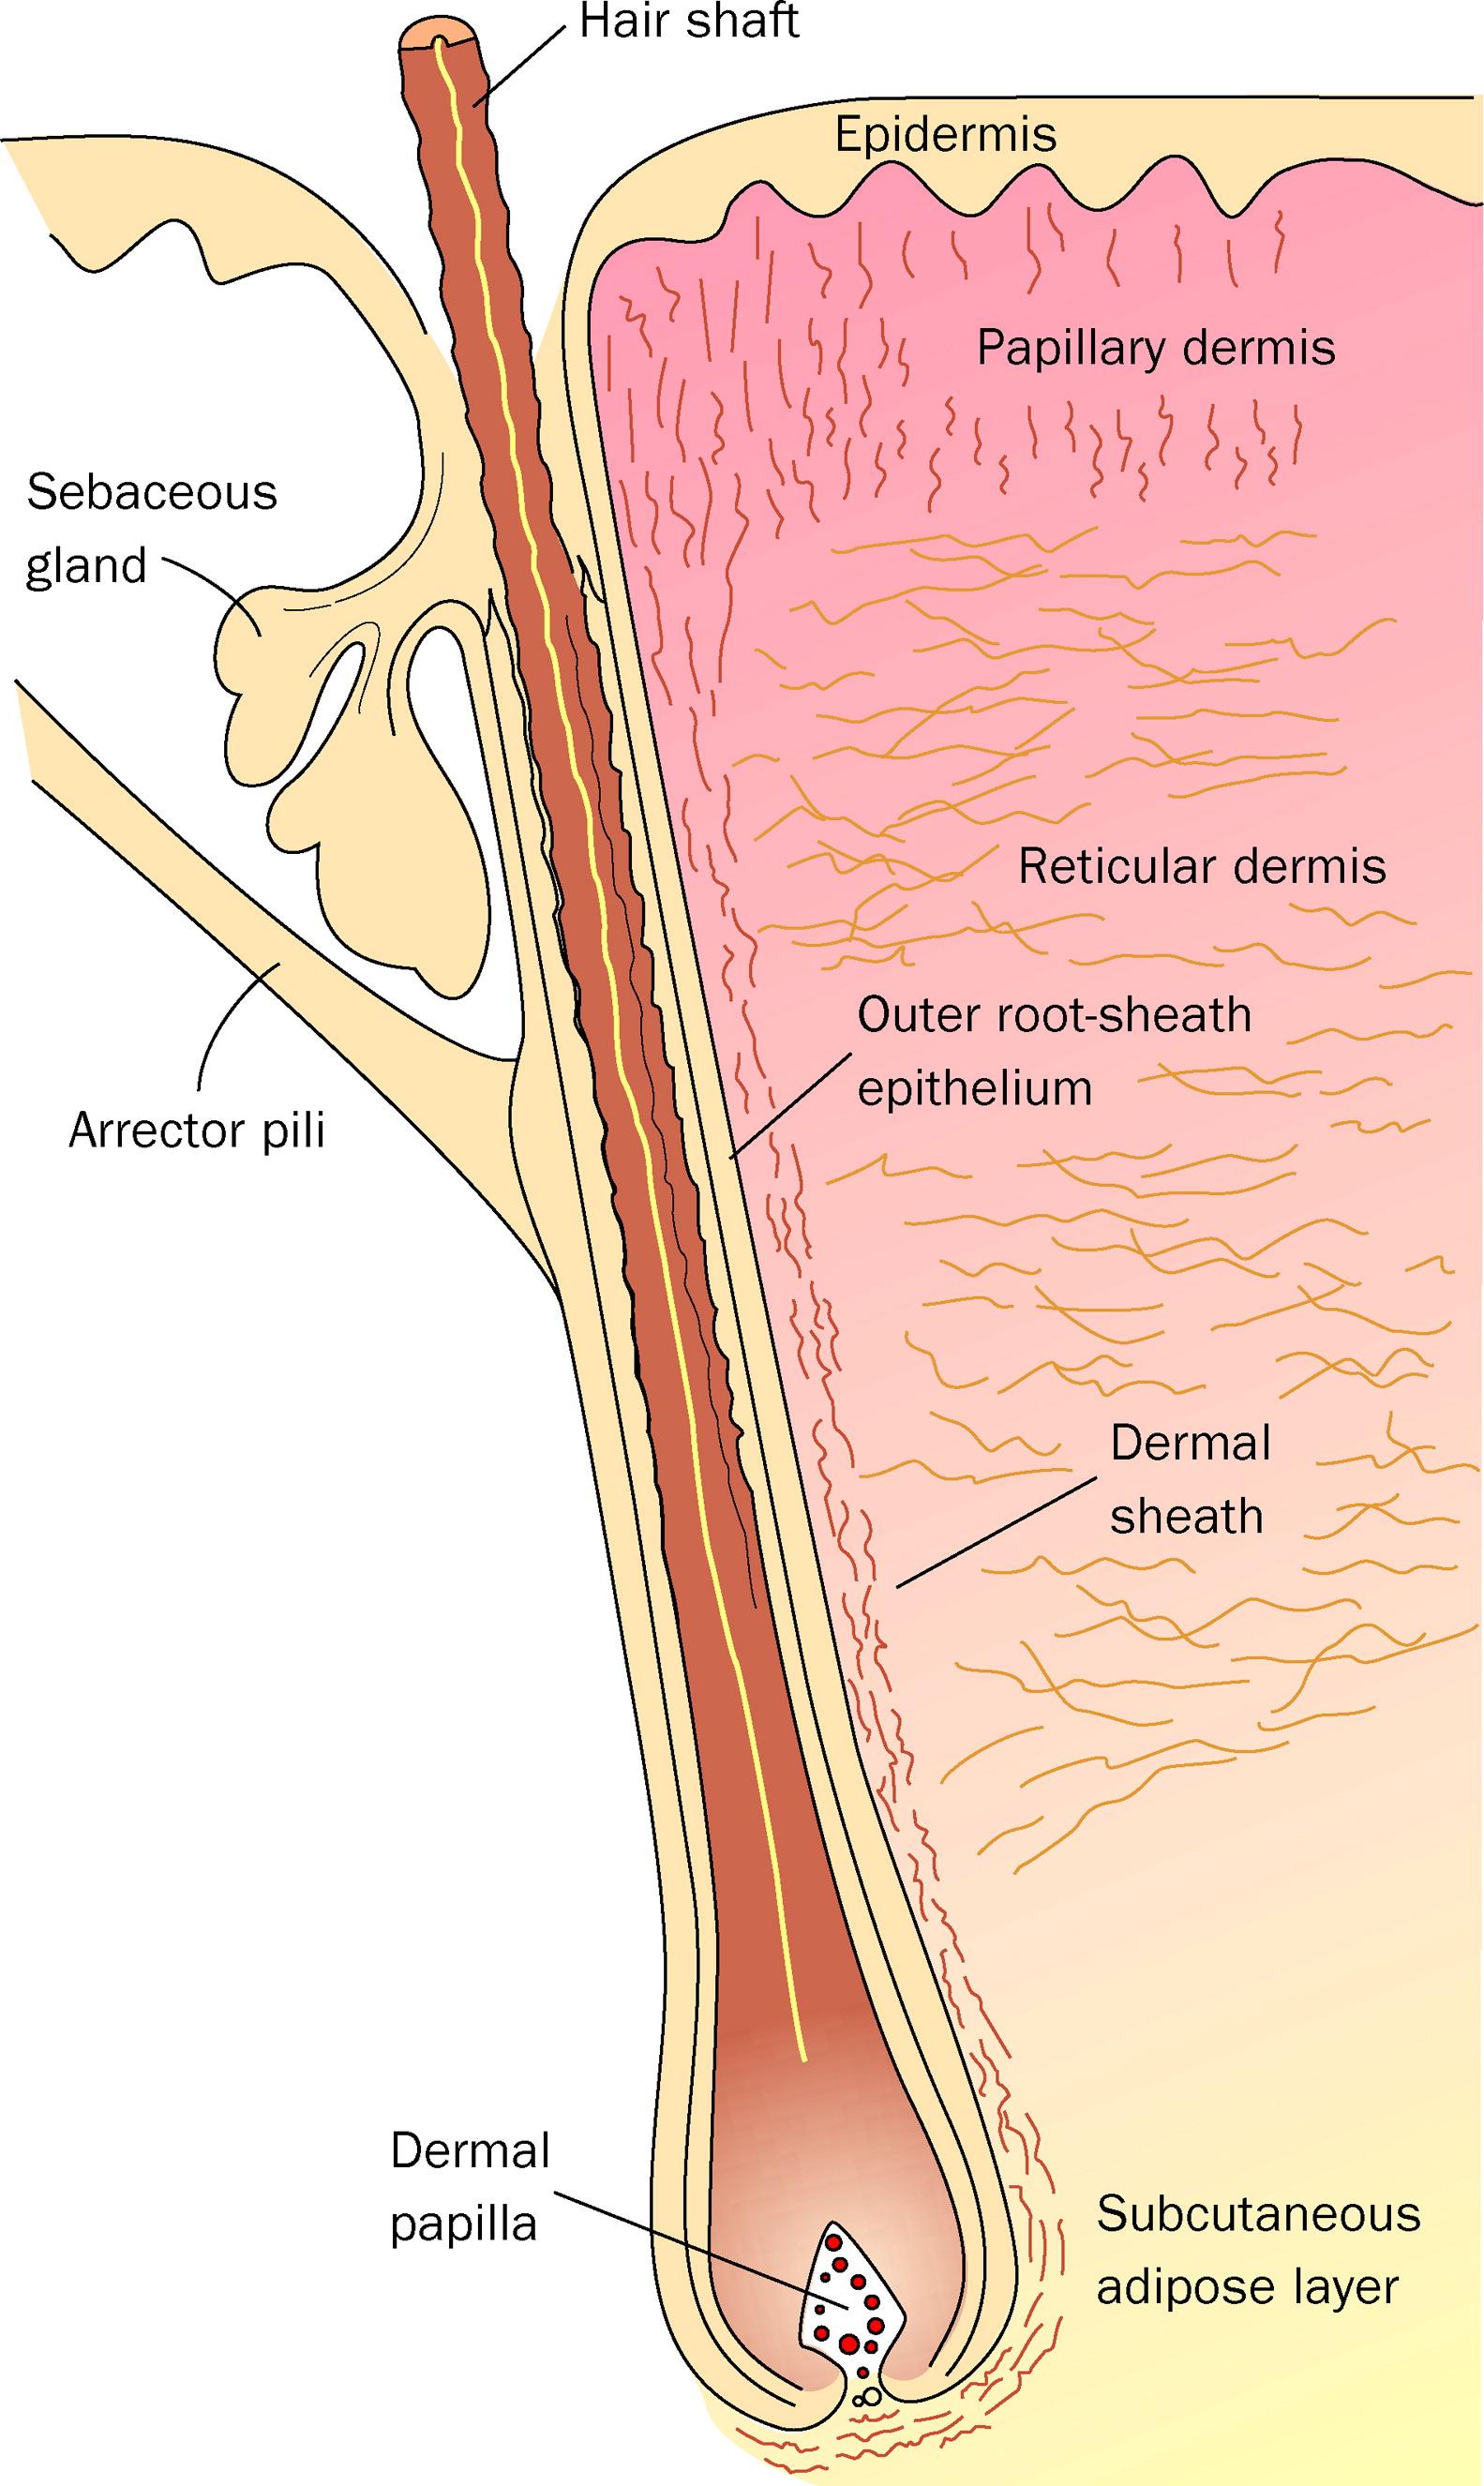 Hair Follicle Dermal Sheath Cells Unsung Participants In Wound Healing